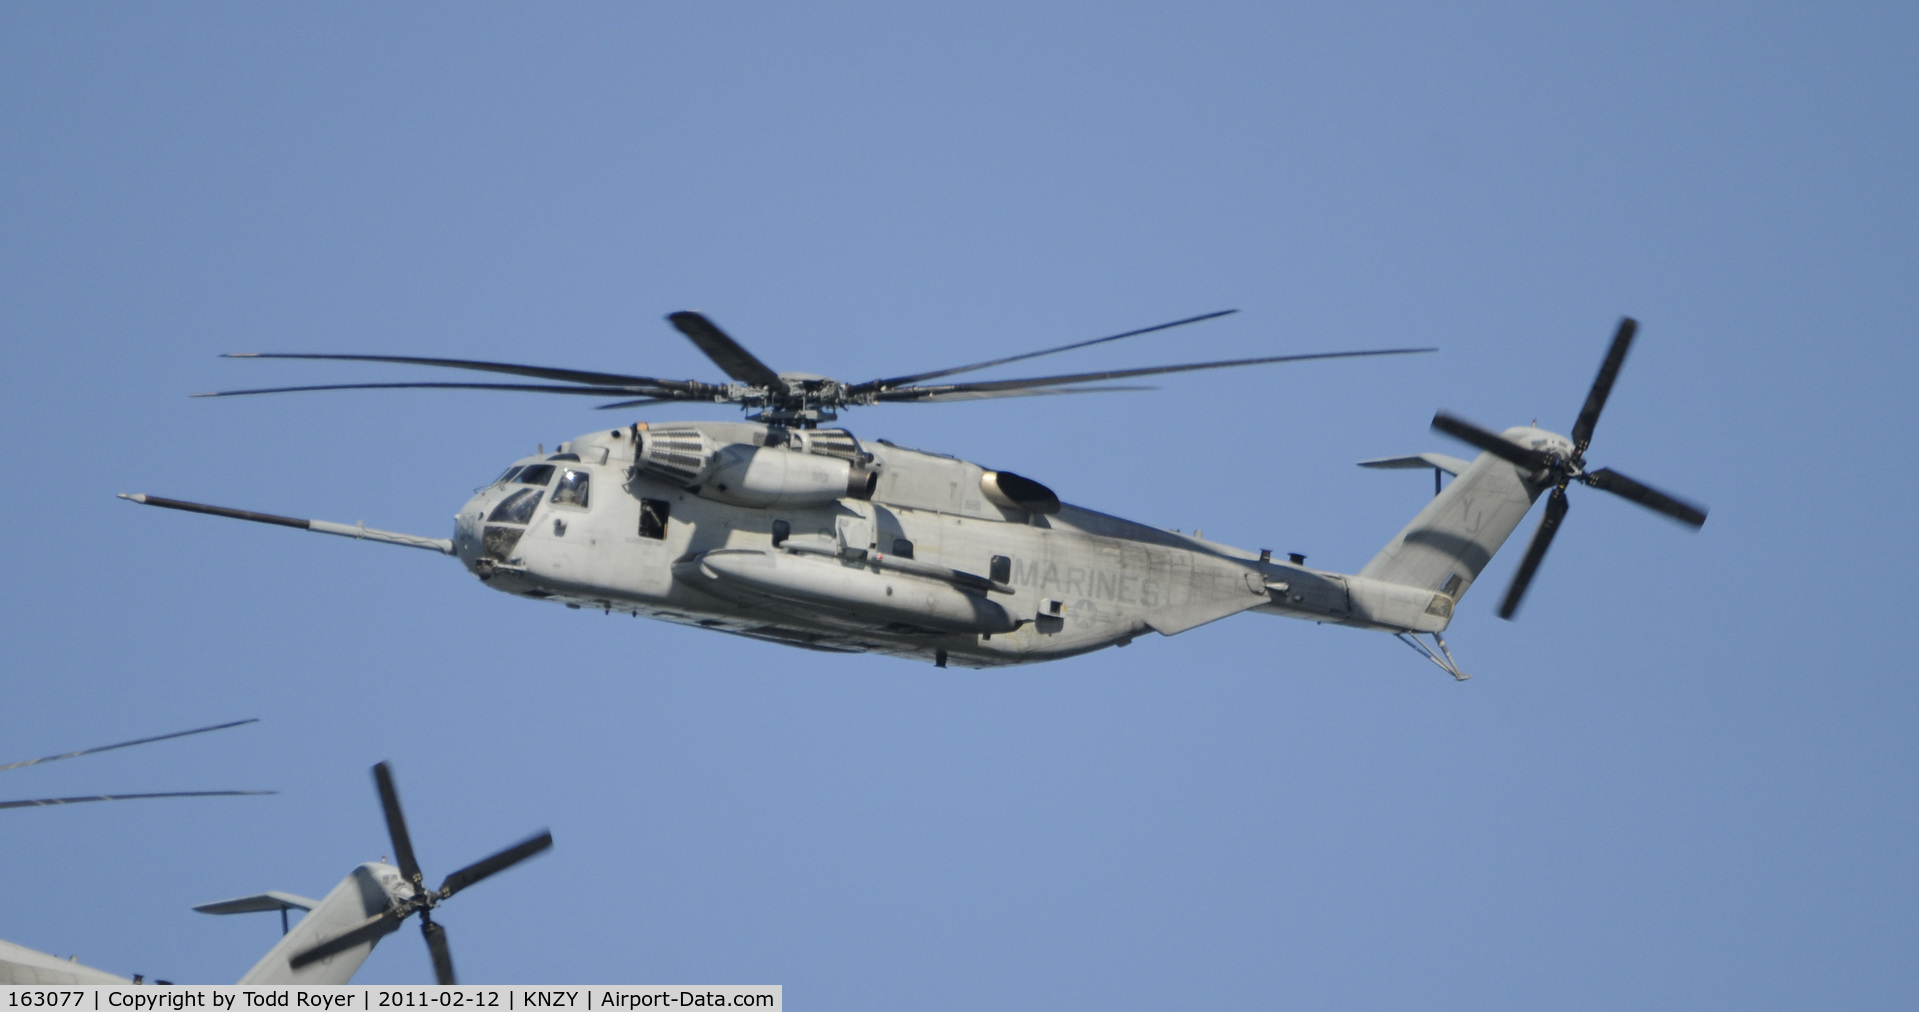 163077, Sikorsky CH-53E Super Stallion C/N 65-568, Centennial of Naval Aviation